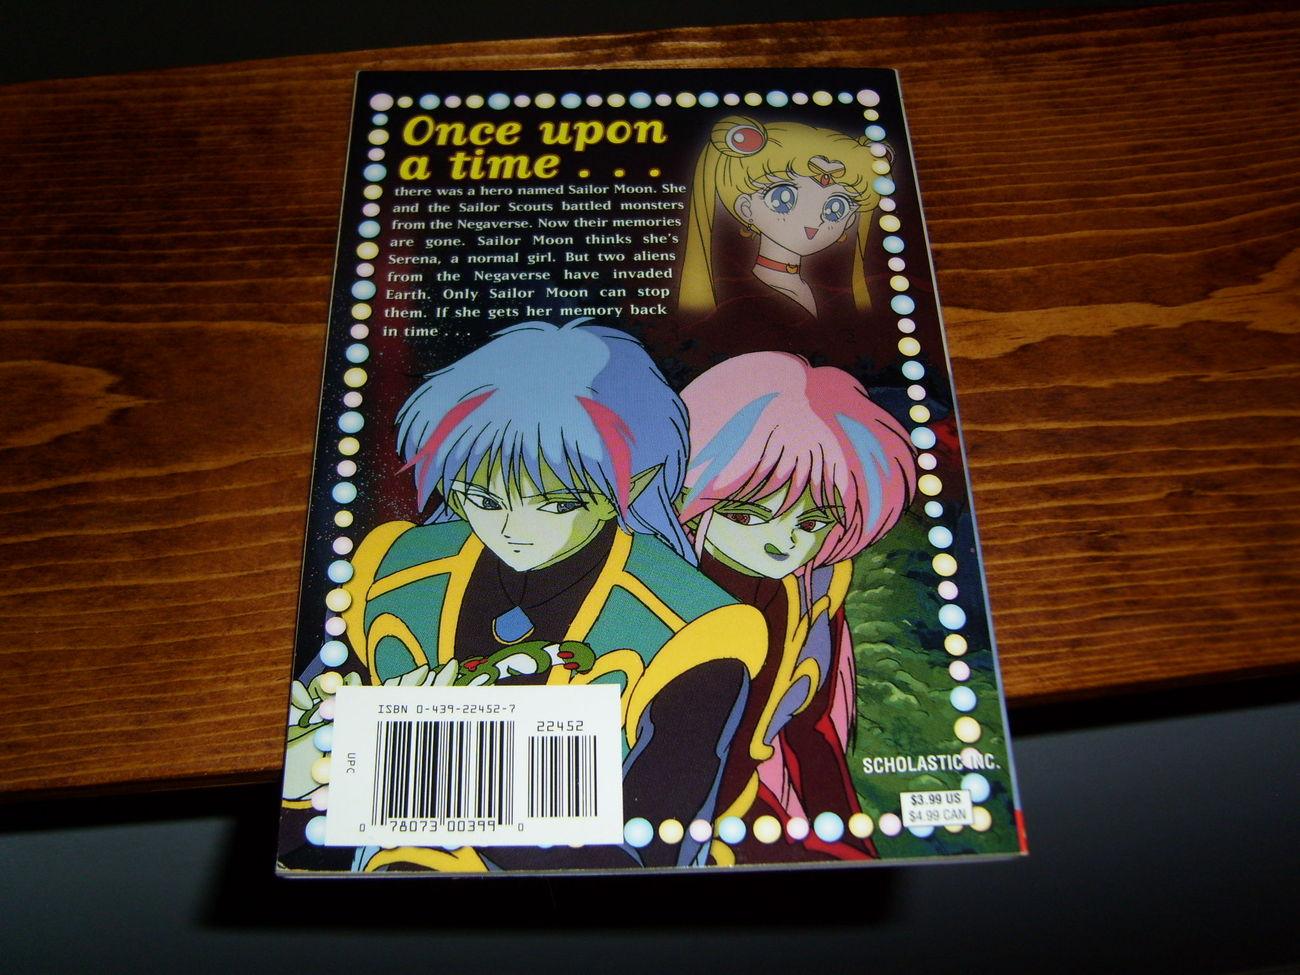 Sailor Moon scholastic book. The Return of Sailor Moon